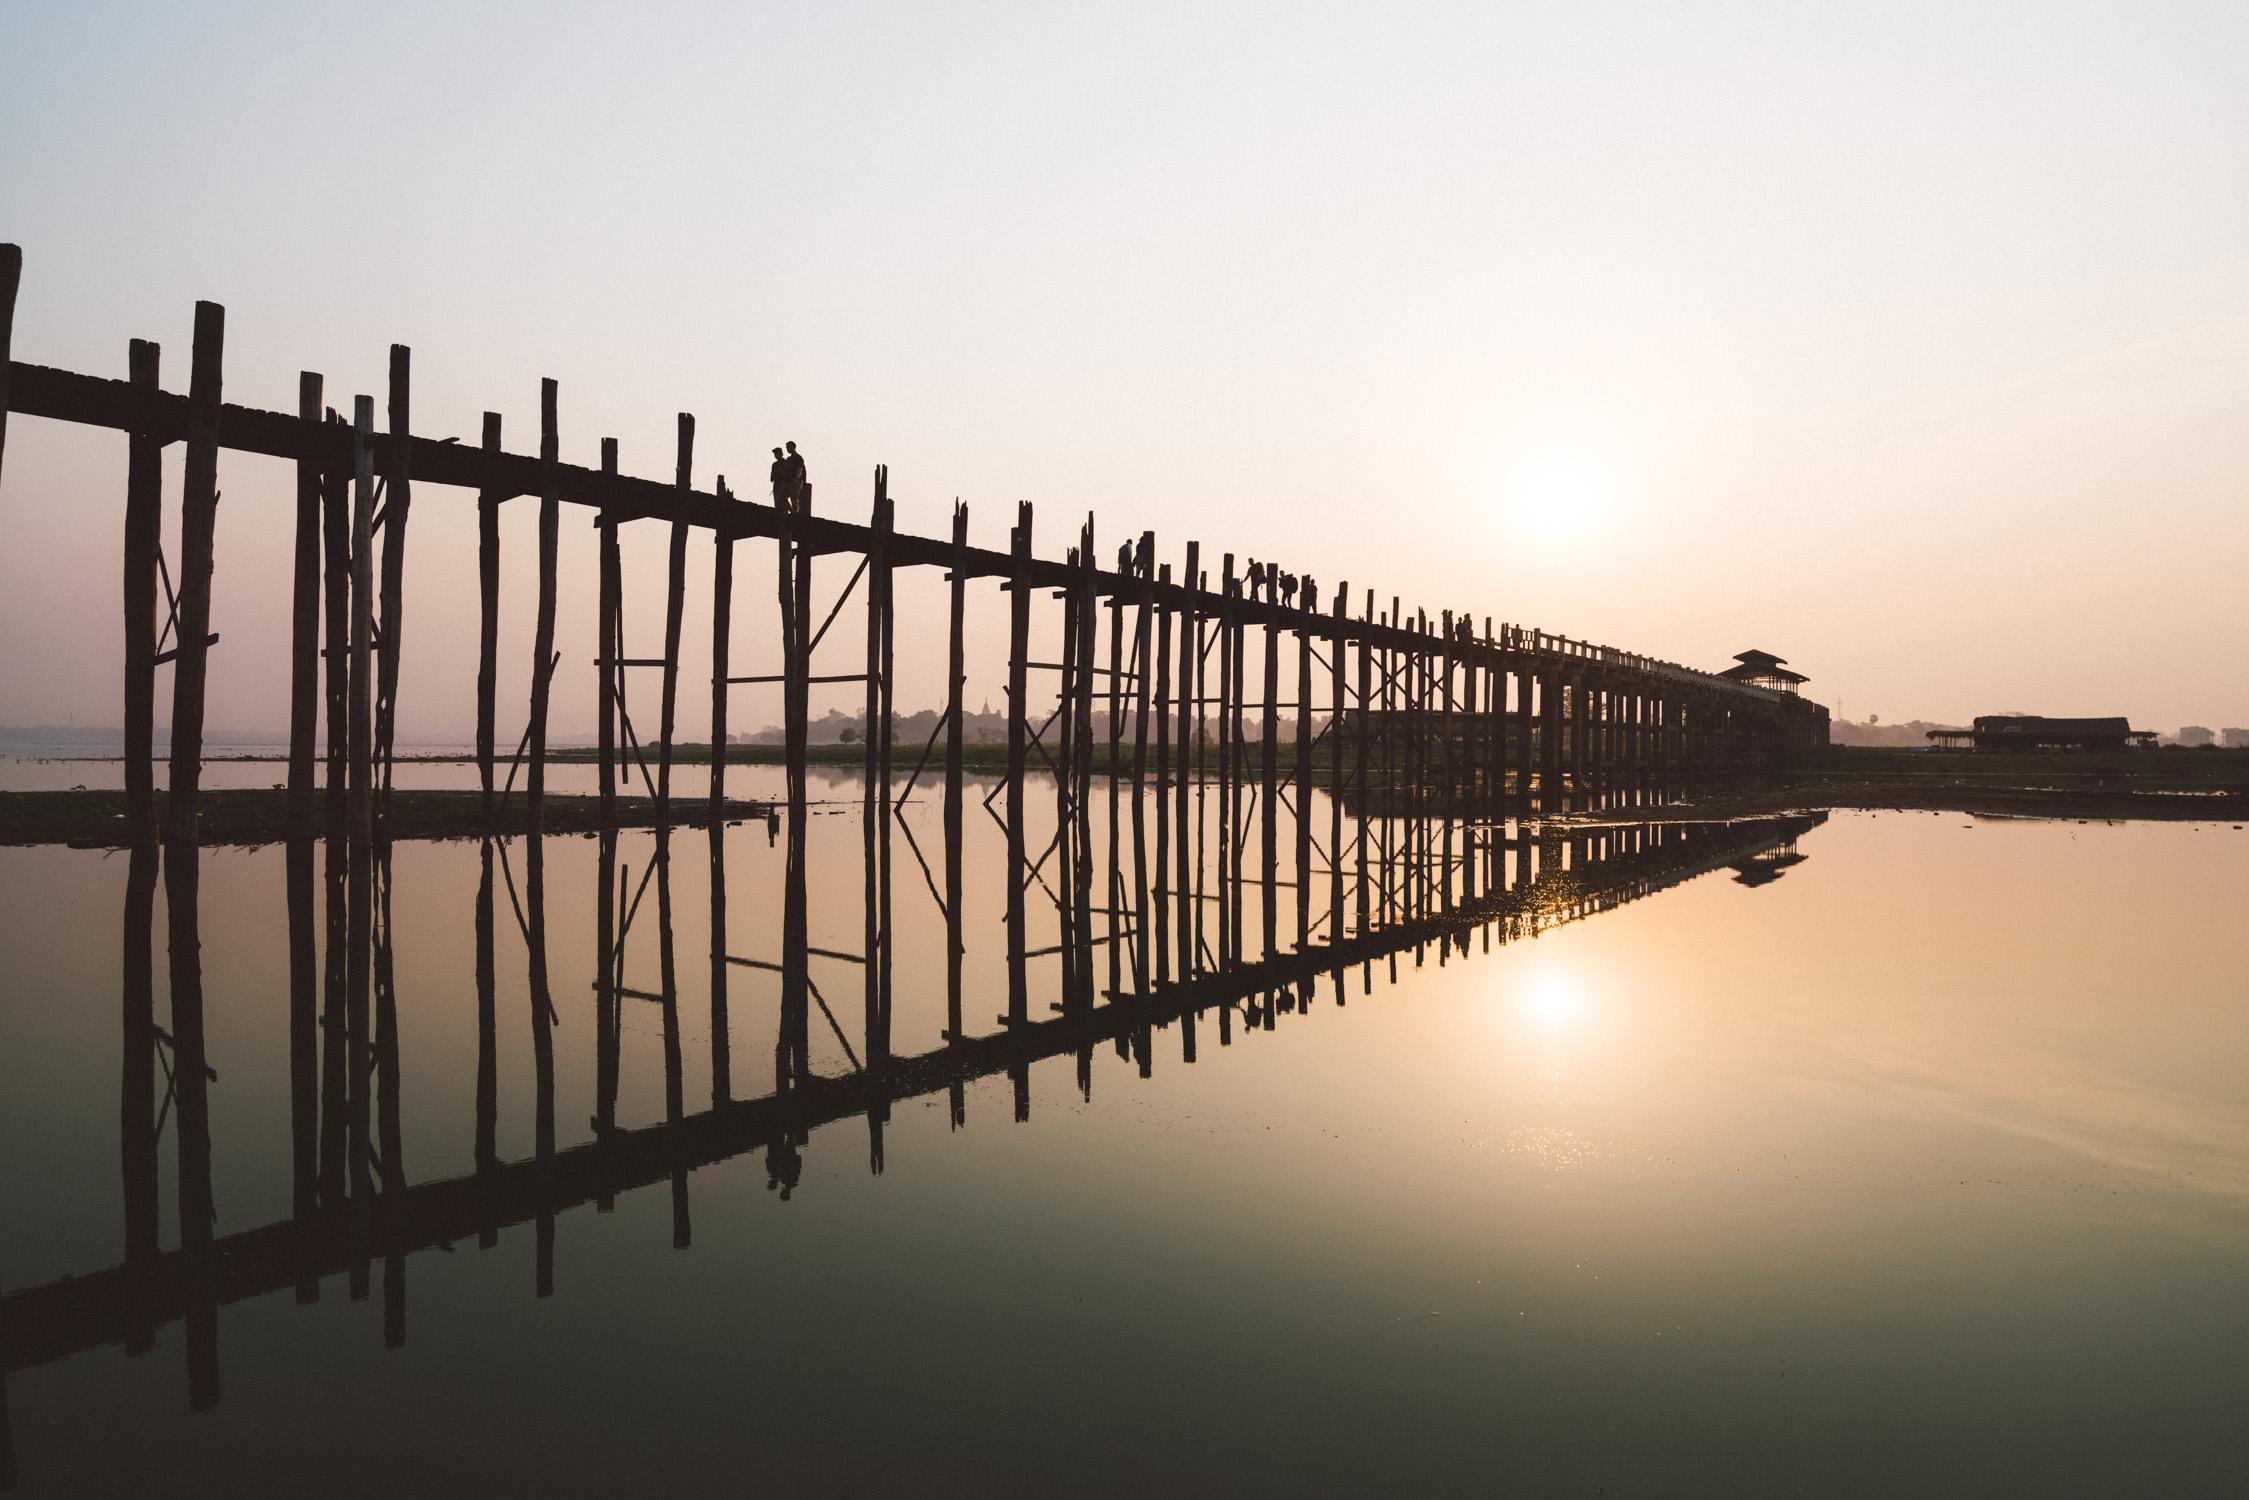 U bein bridge with reflexion [David Tan]